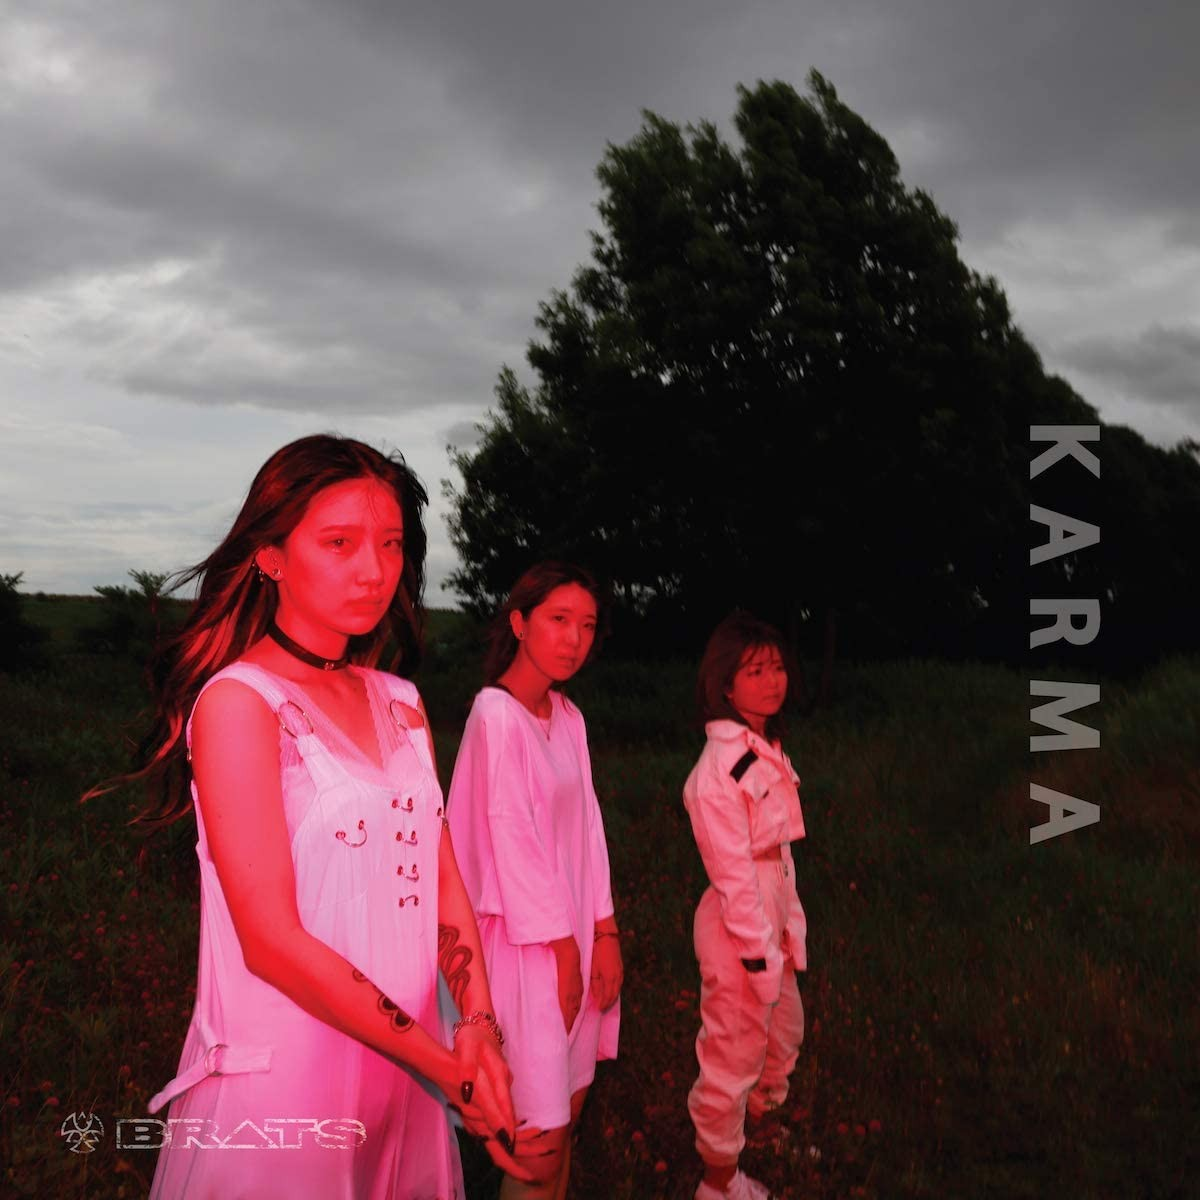 [Album] BRATS – KARMA [FLAC + MP3 320 / CD] [2020.09.30]